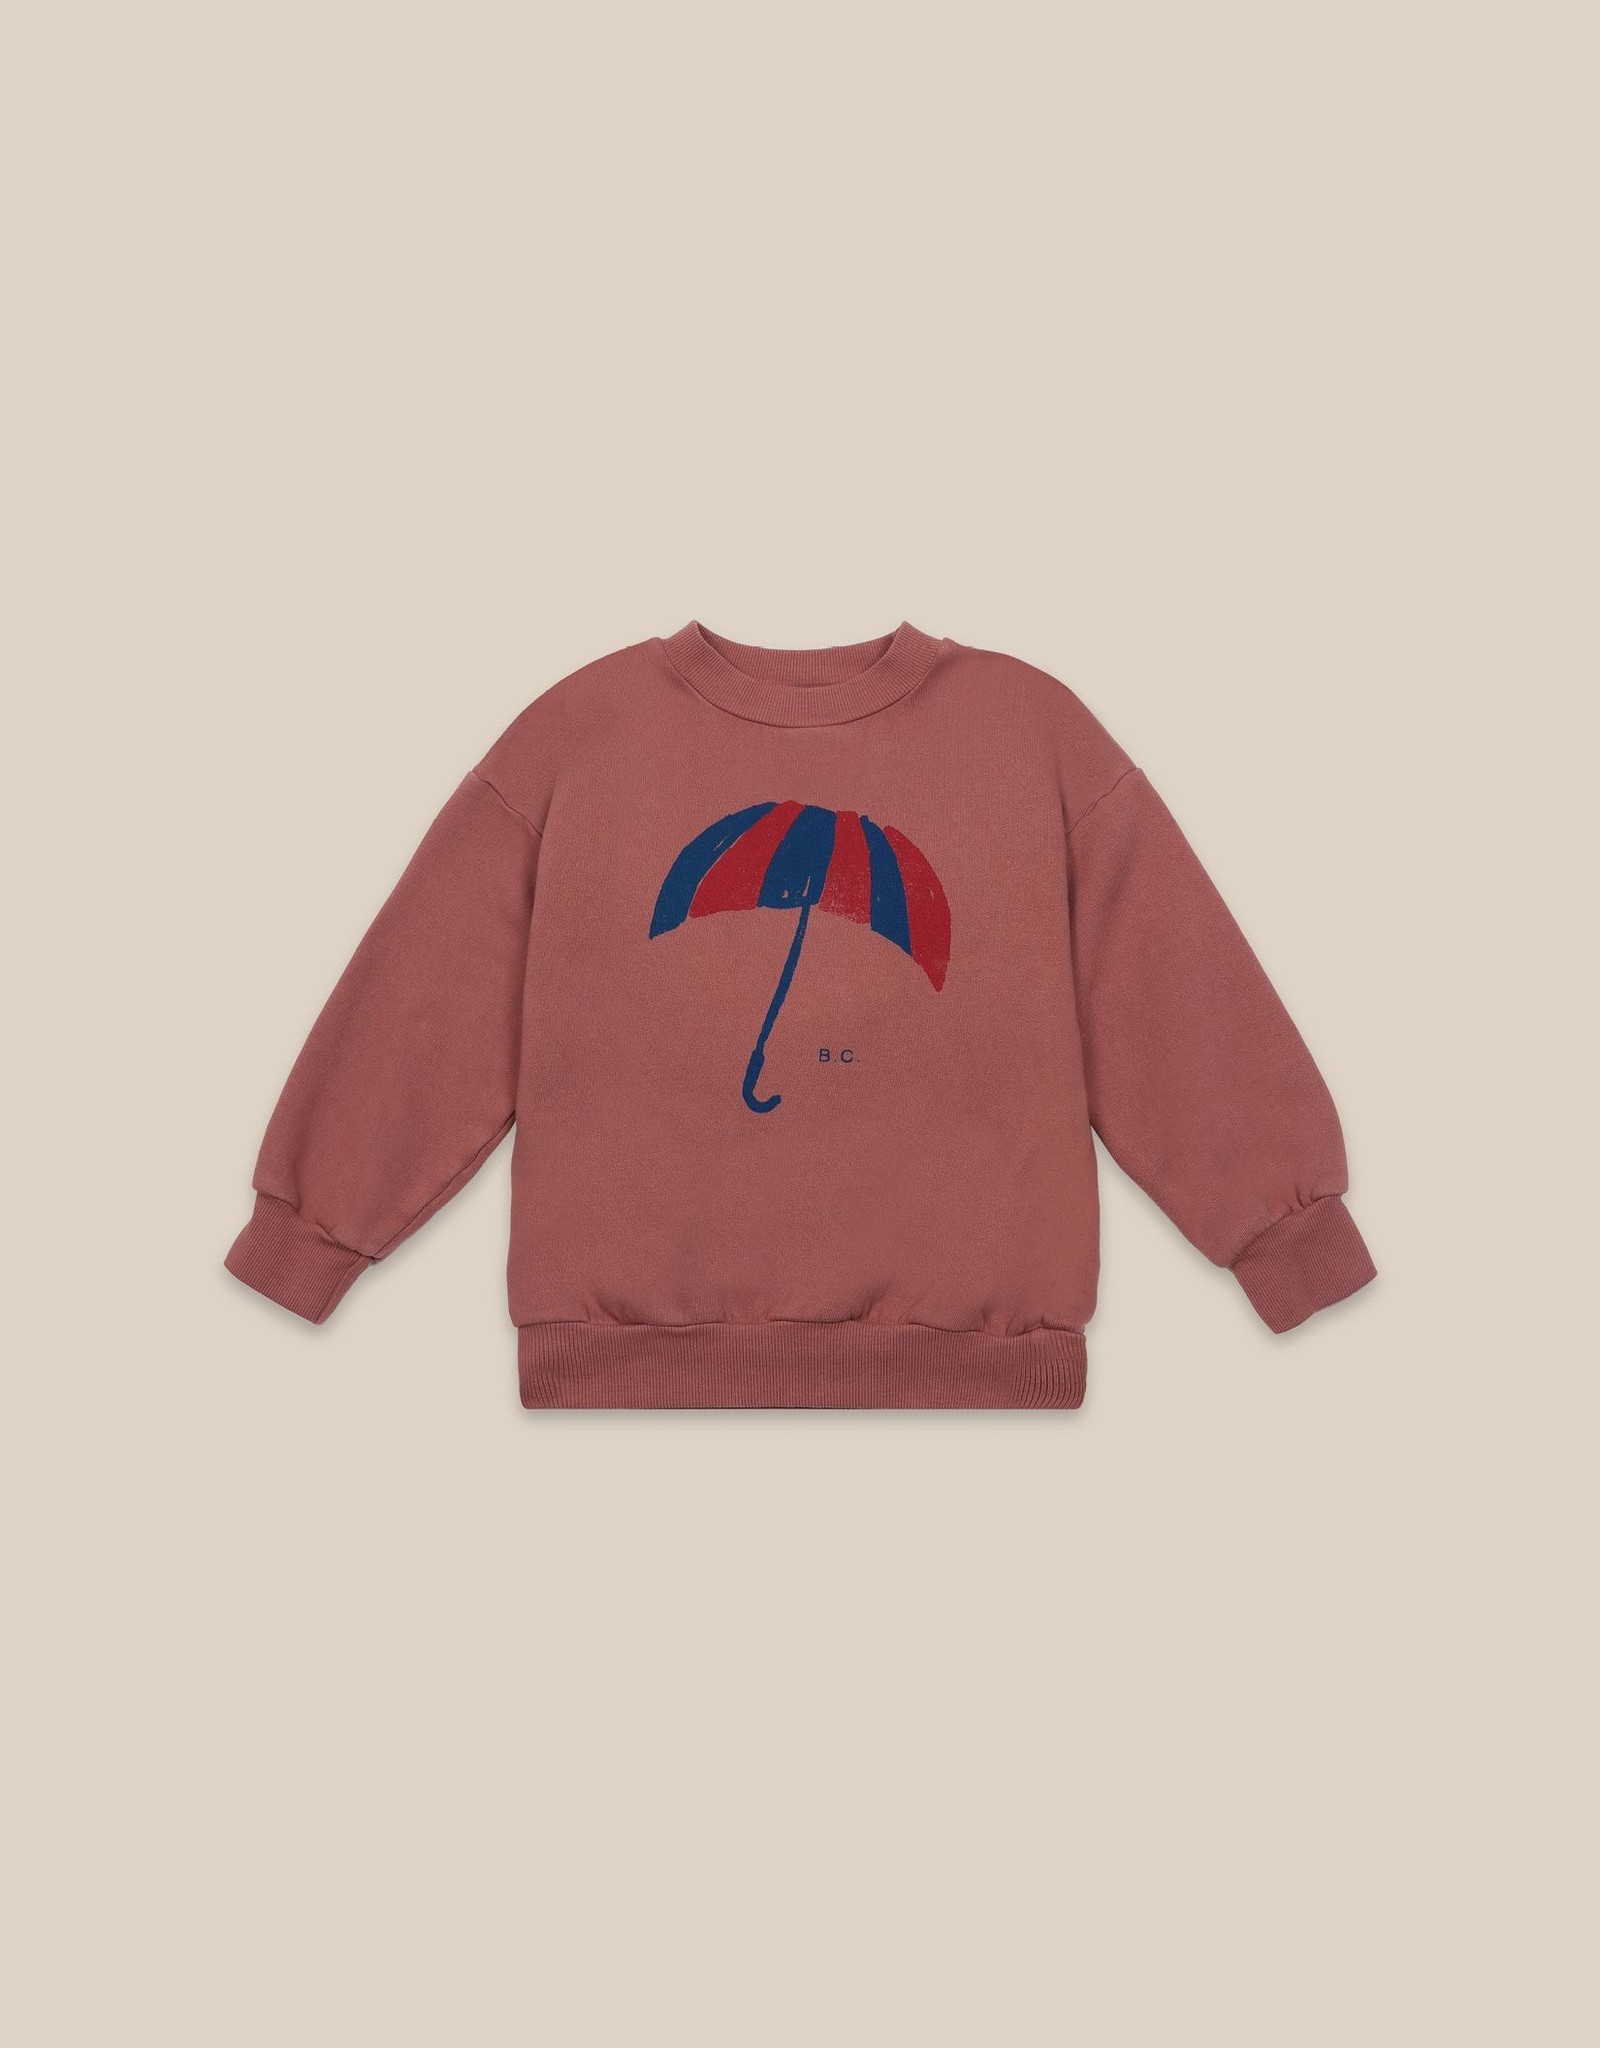 Bobo Choses - Umbrella Sweatshirt